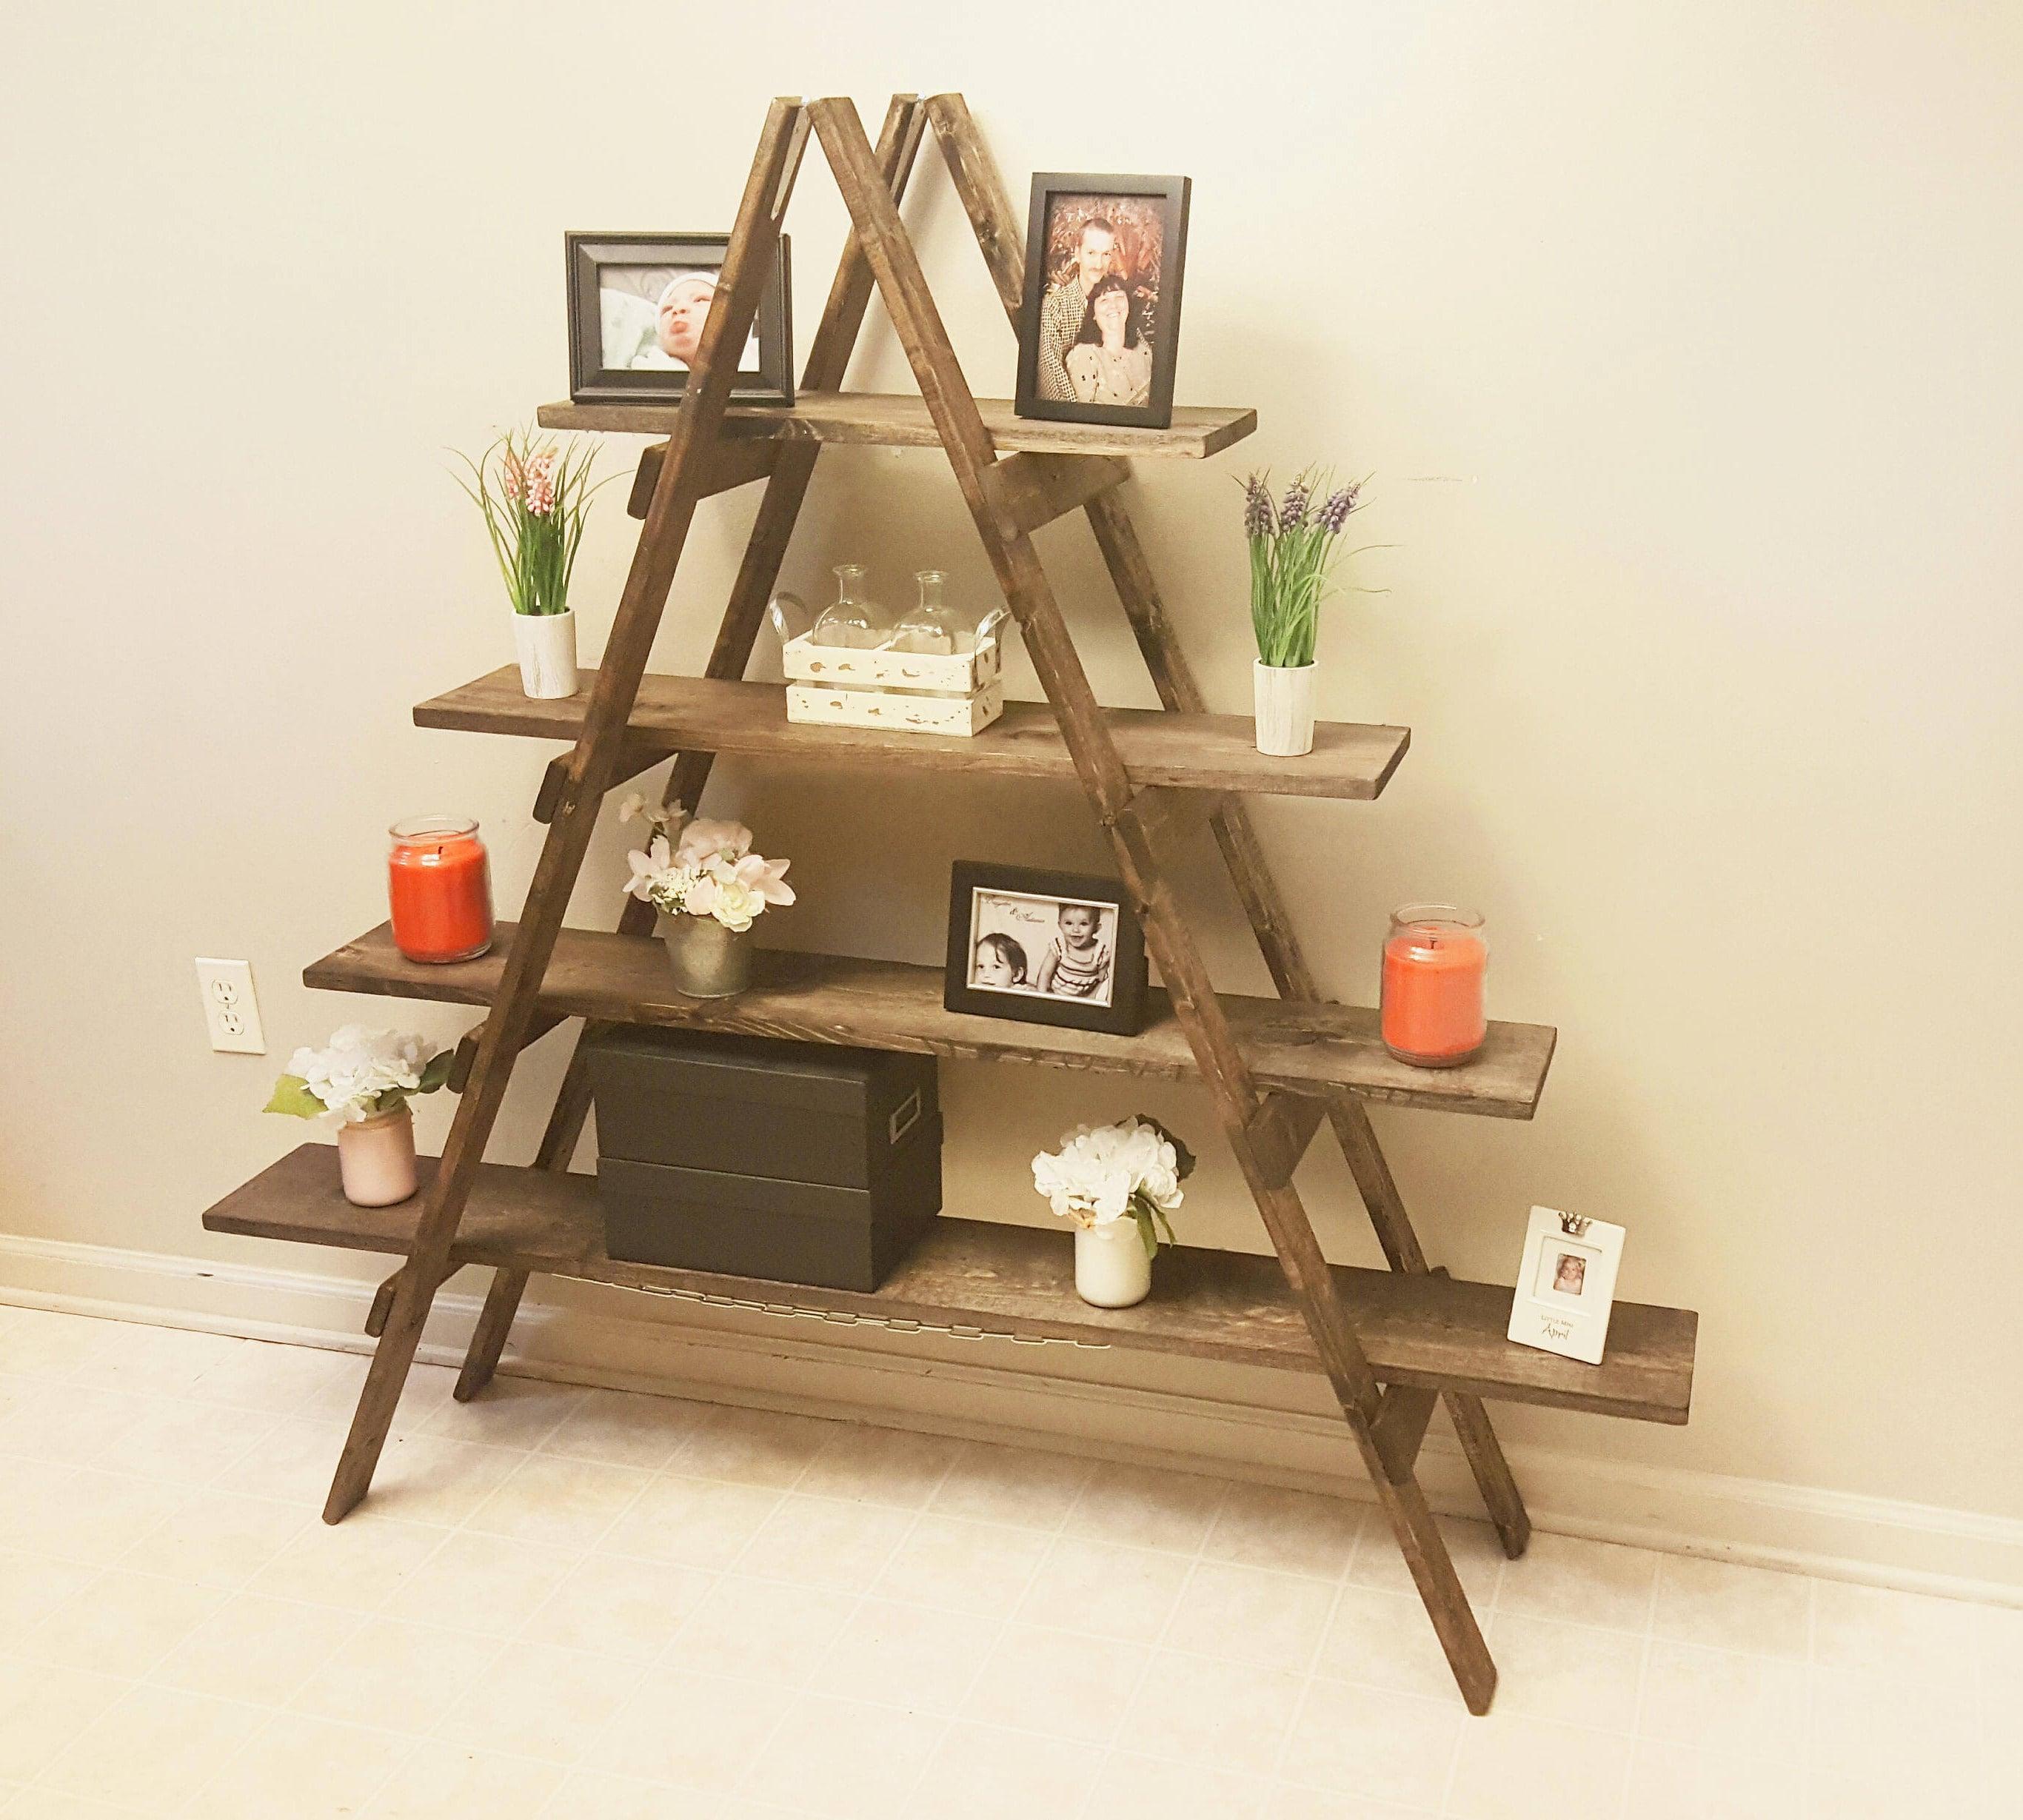 Cascade Ladder Shelf Rustic Bookshelf Rustic Bookcase | Etsy